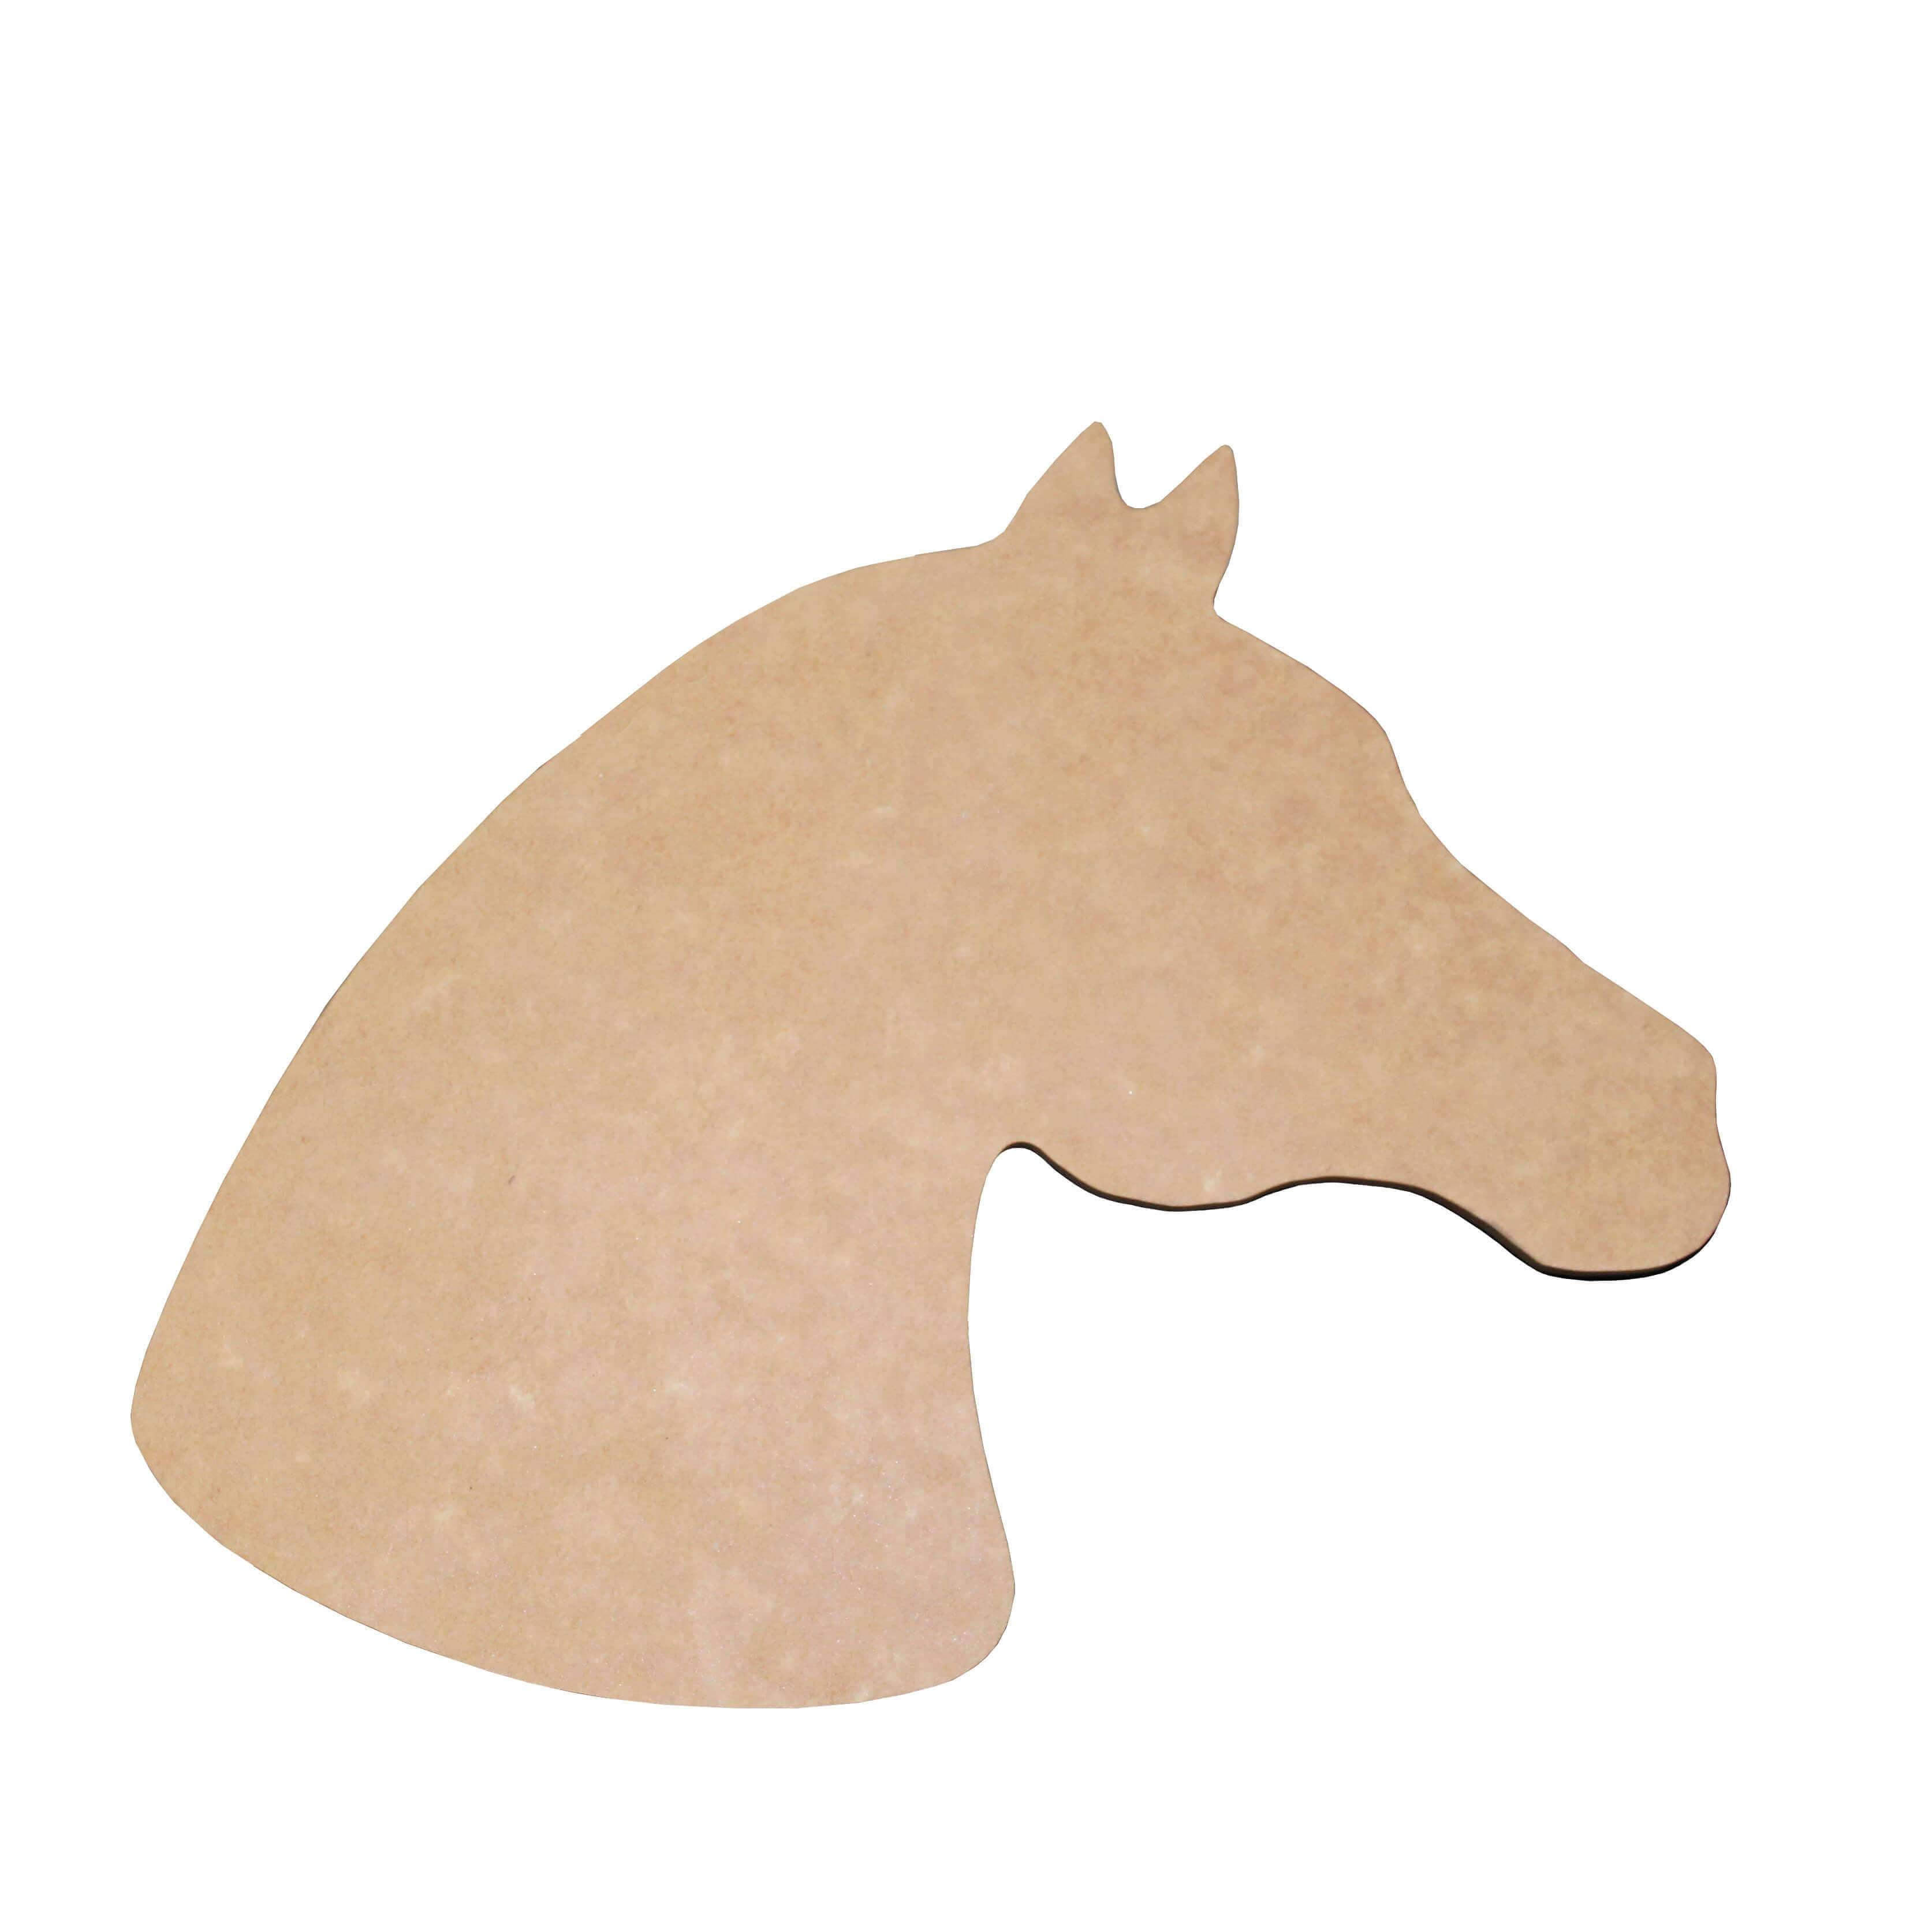 horse-head-cutting-board.jpg